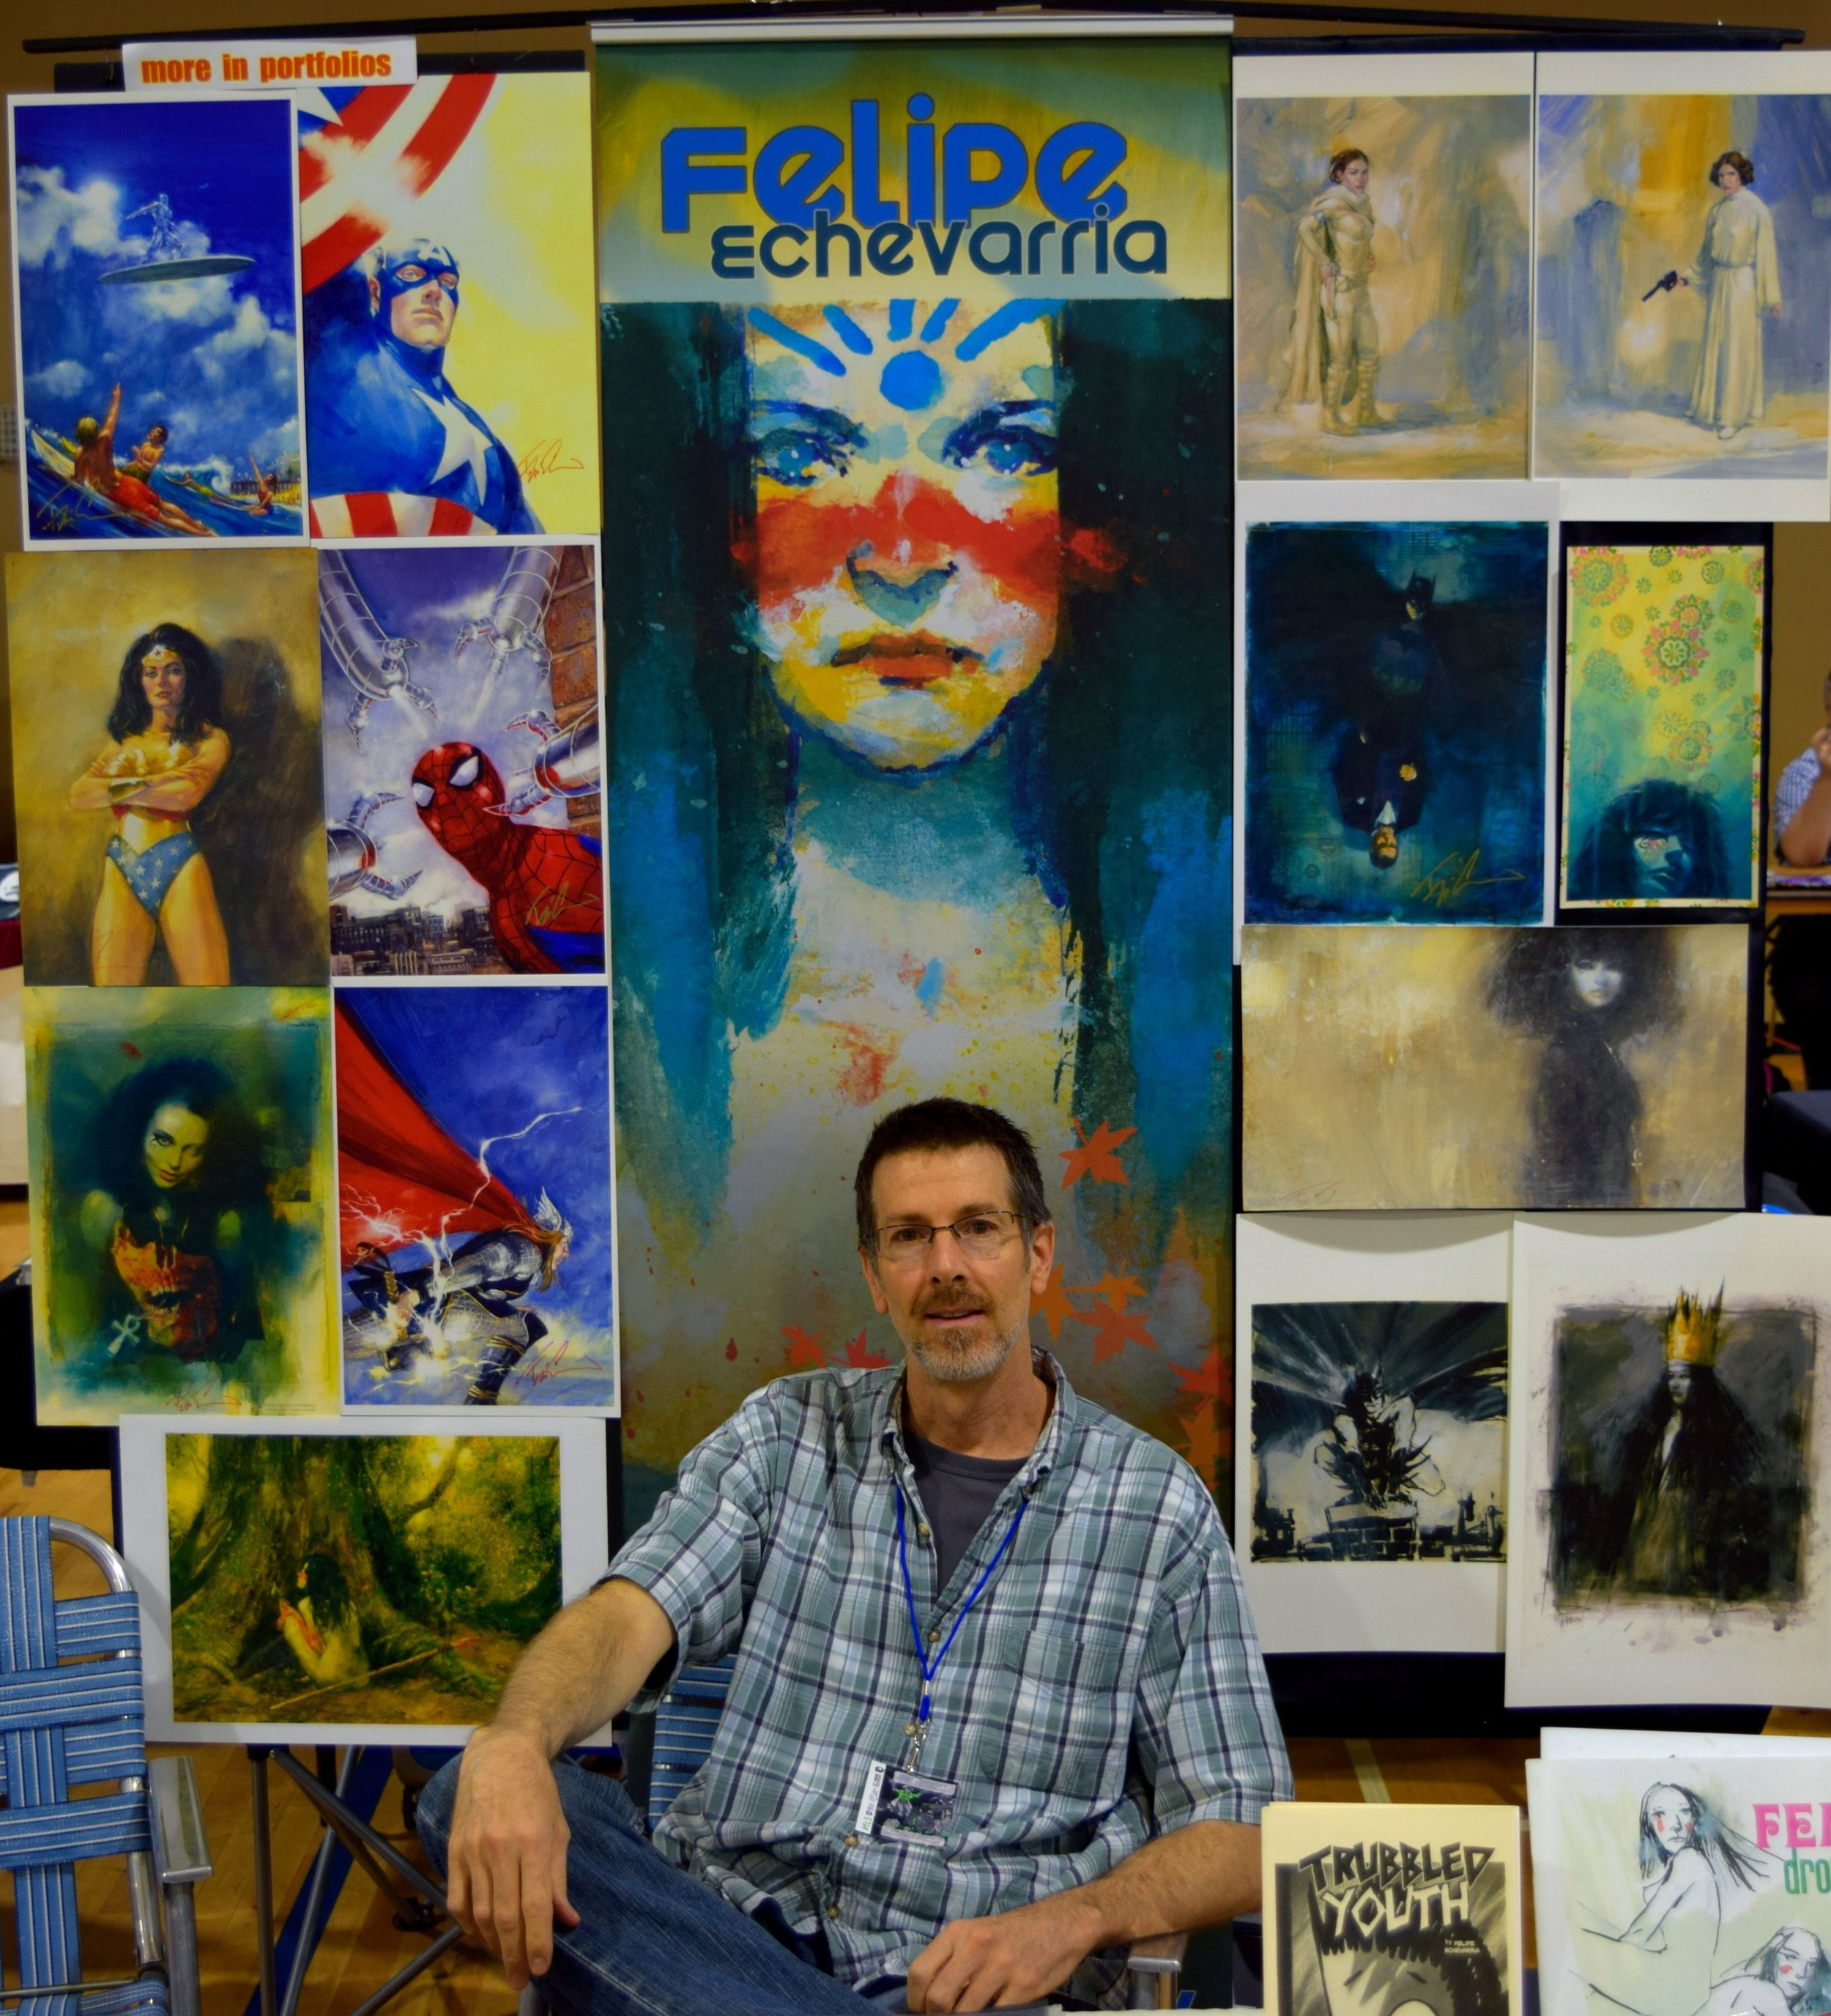 Felipe Echevarria at Fort Collins Comic Con 2016. (2)